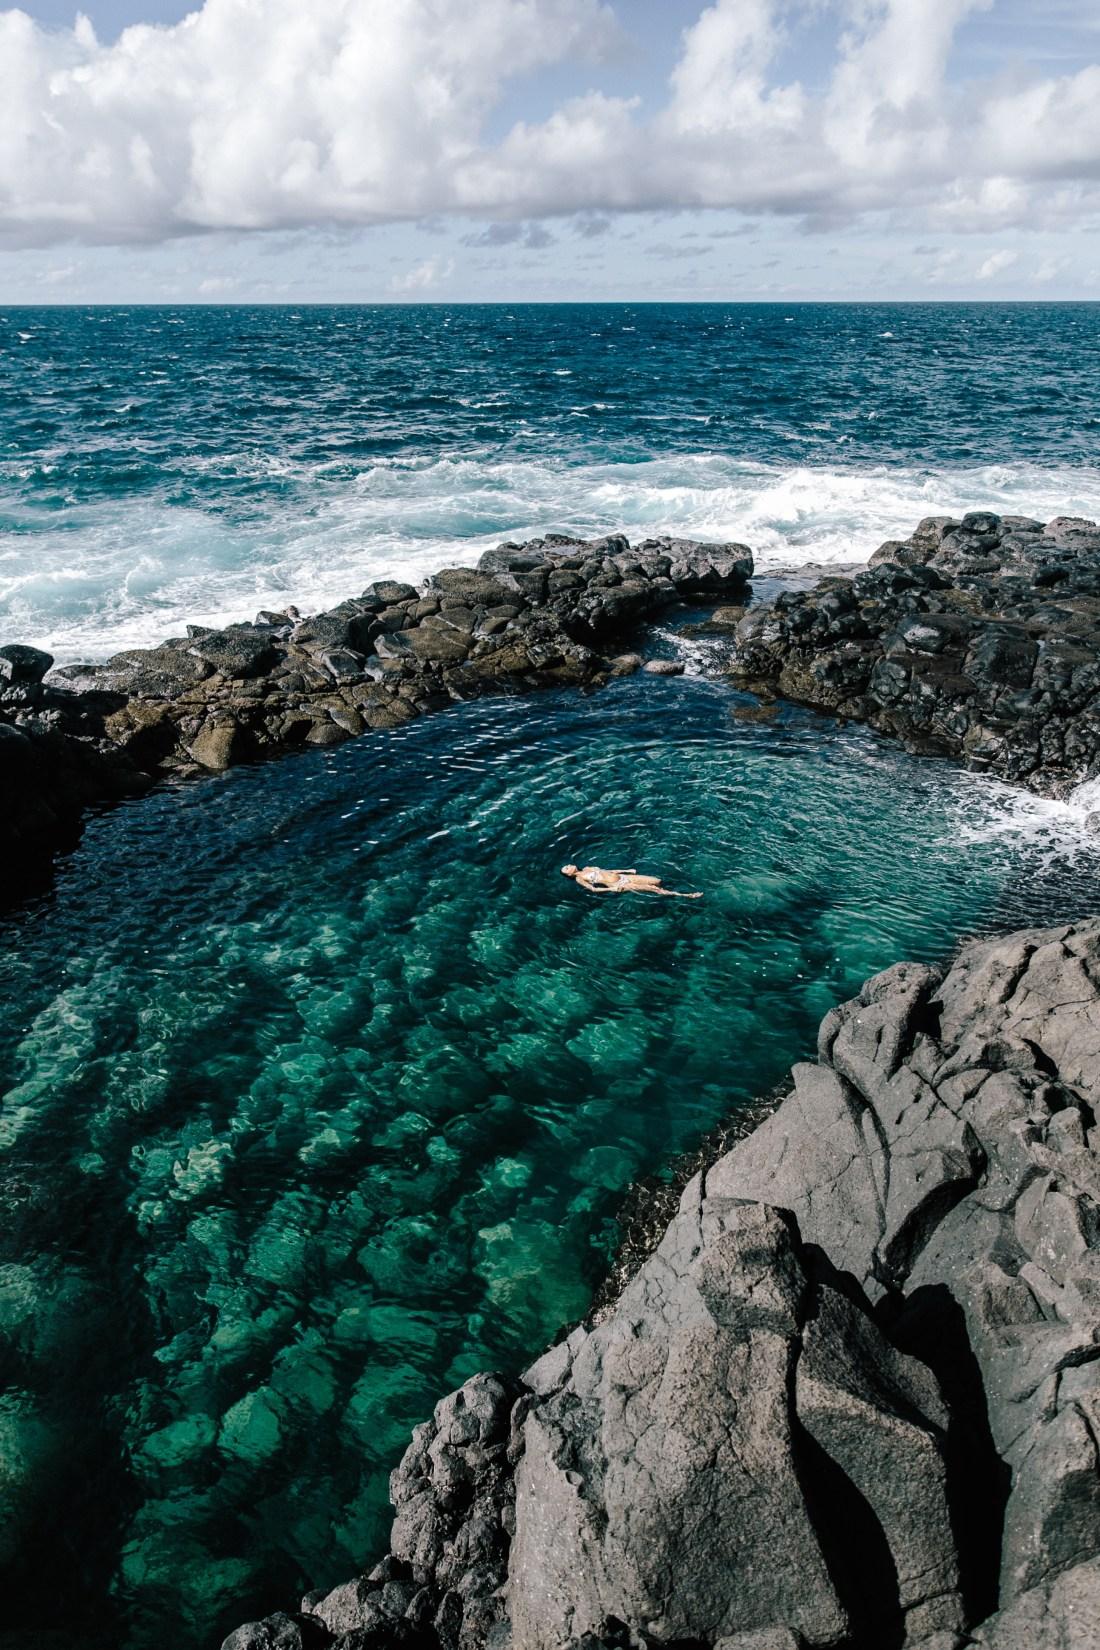 Queen's Bath Kauai   Travel Guide to Kauai, Hawaii   Travel Tips for Kauai   Packing List for Kauai   Helpful Tips for Traveling to Kauai   Kauai Travel Guide   Hawaii Travel Guide   Why You Should Visit Hawaii   Napali Coast Boat Excursion   Activities To Do in Kauai   Best Vacation Places in the World via @elanaloo + elanaloo.com